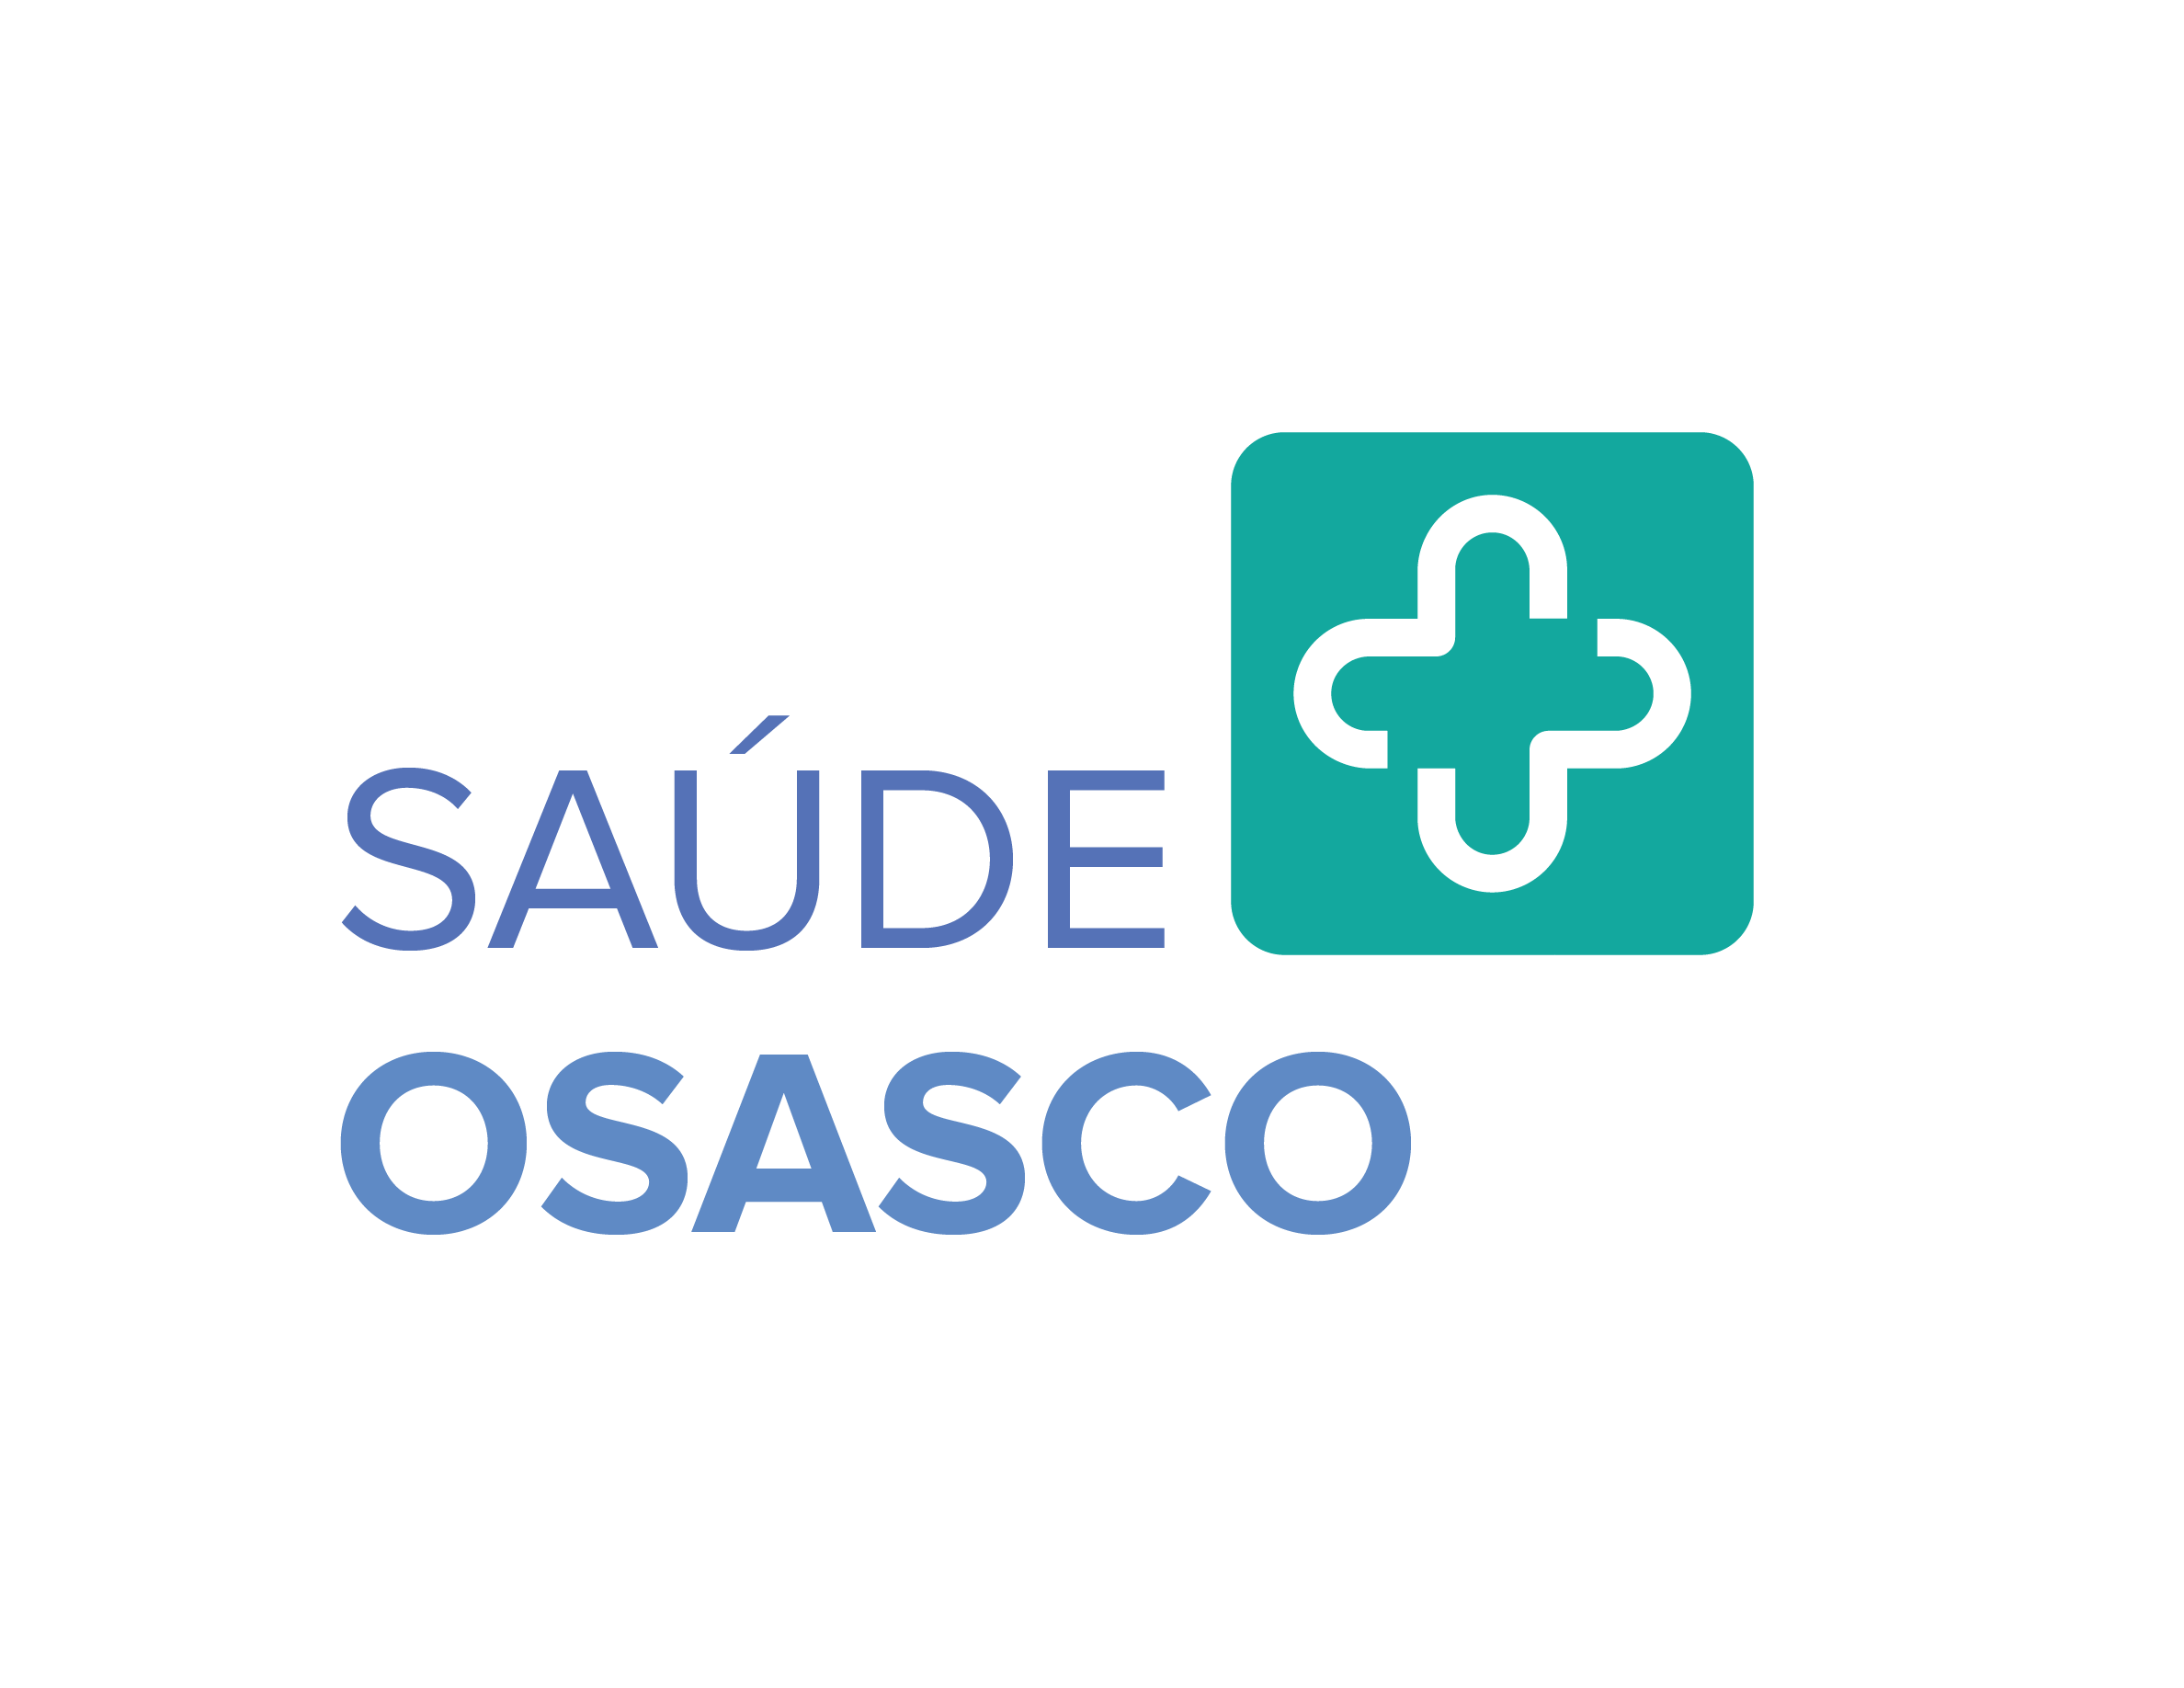 prefeitura-osasco-programas-acoes-saude-osasco